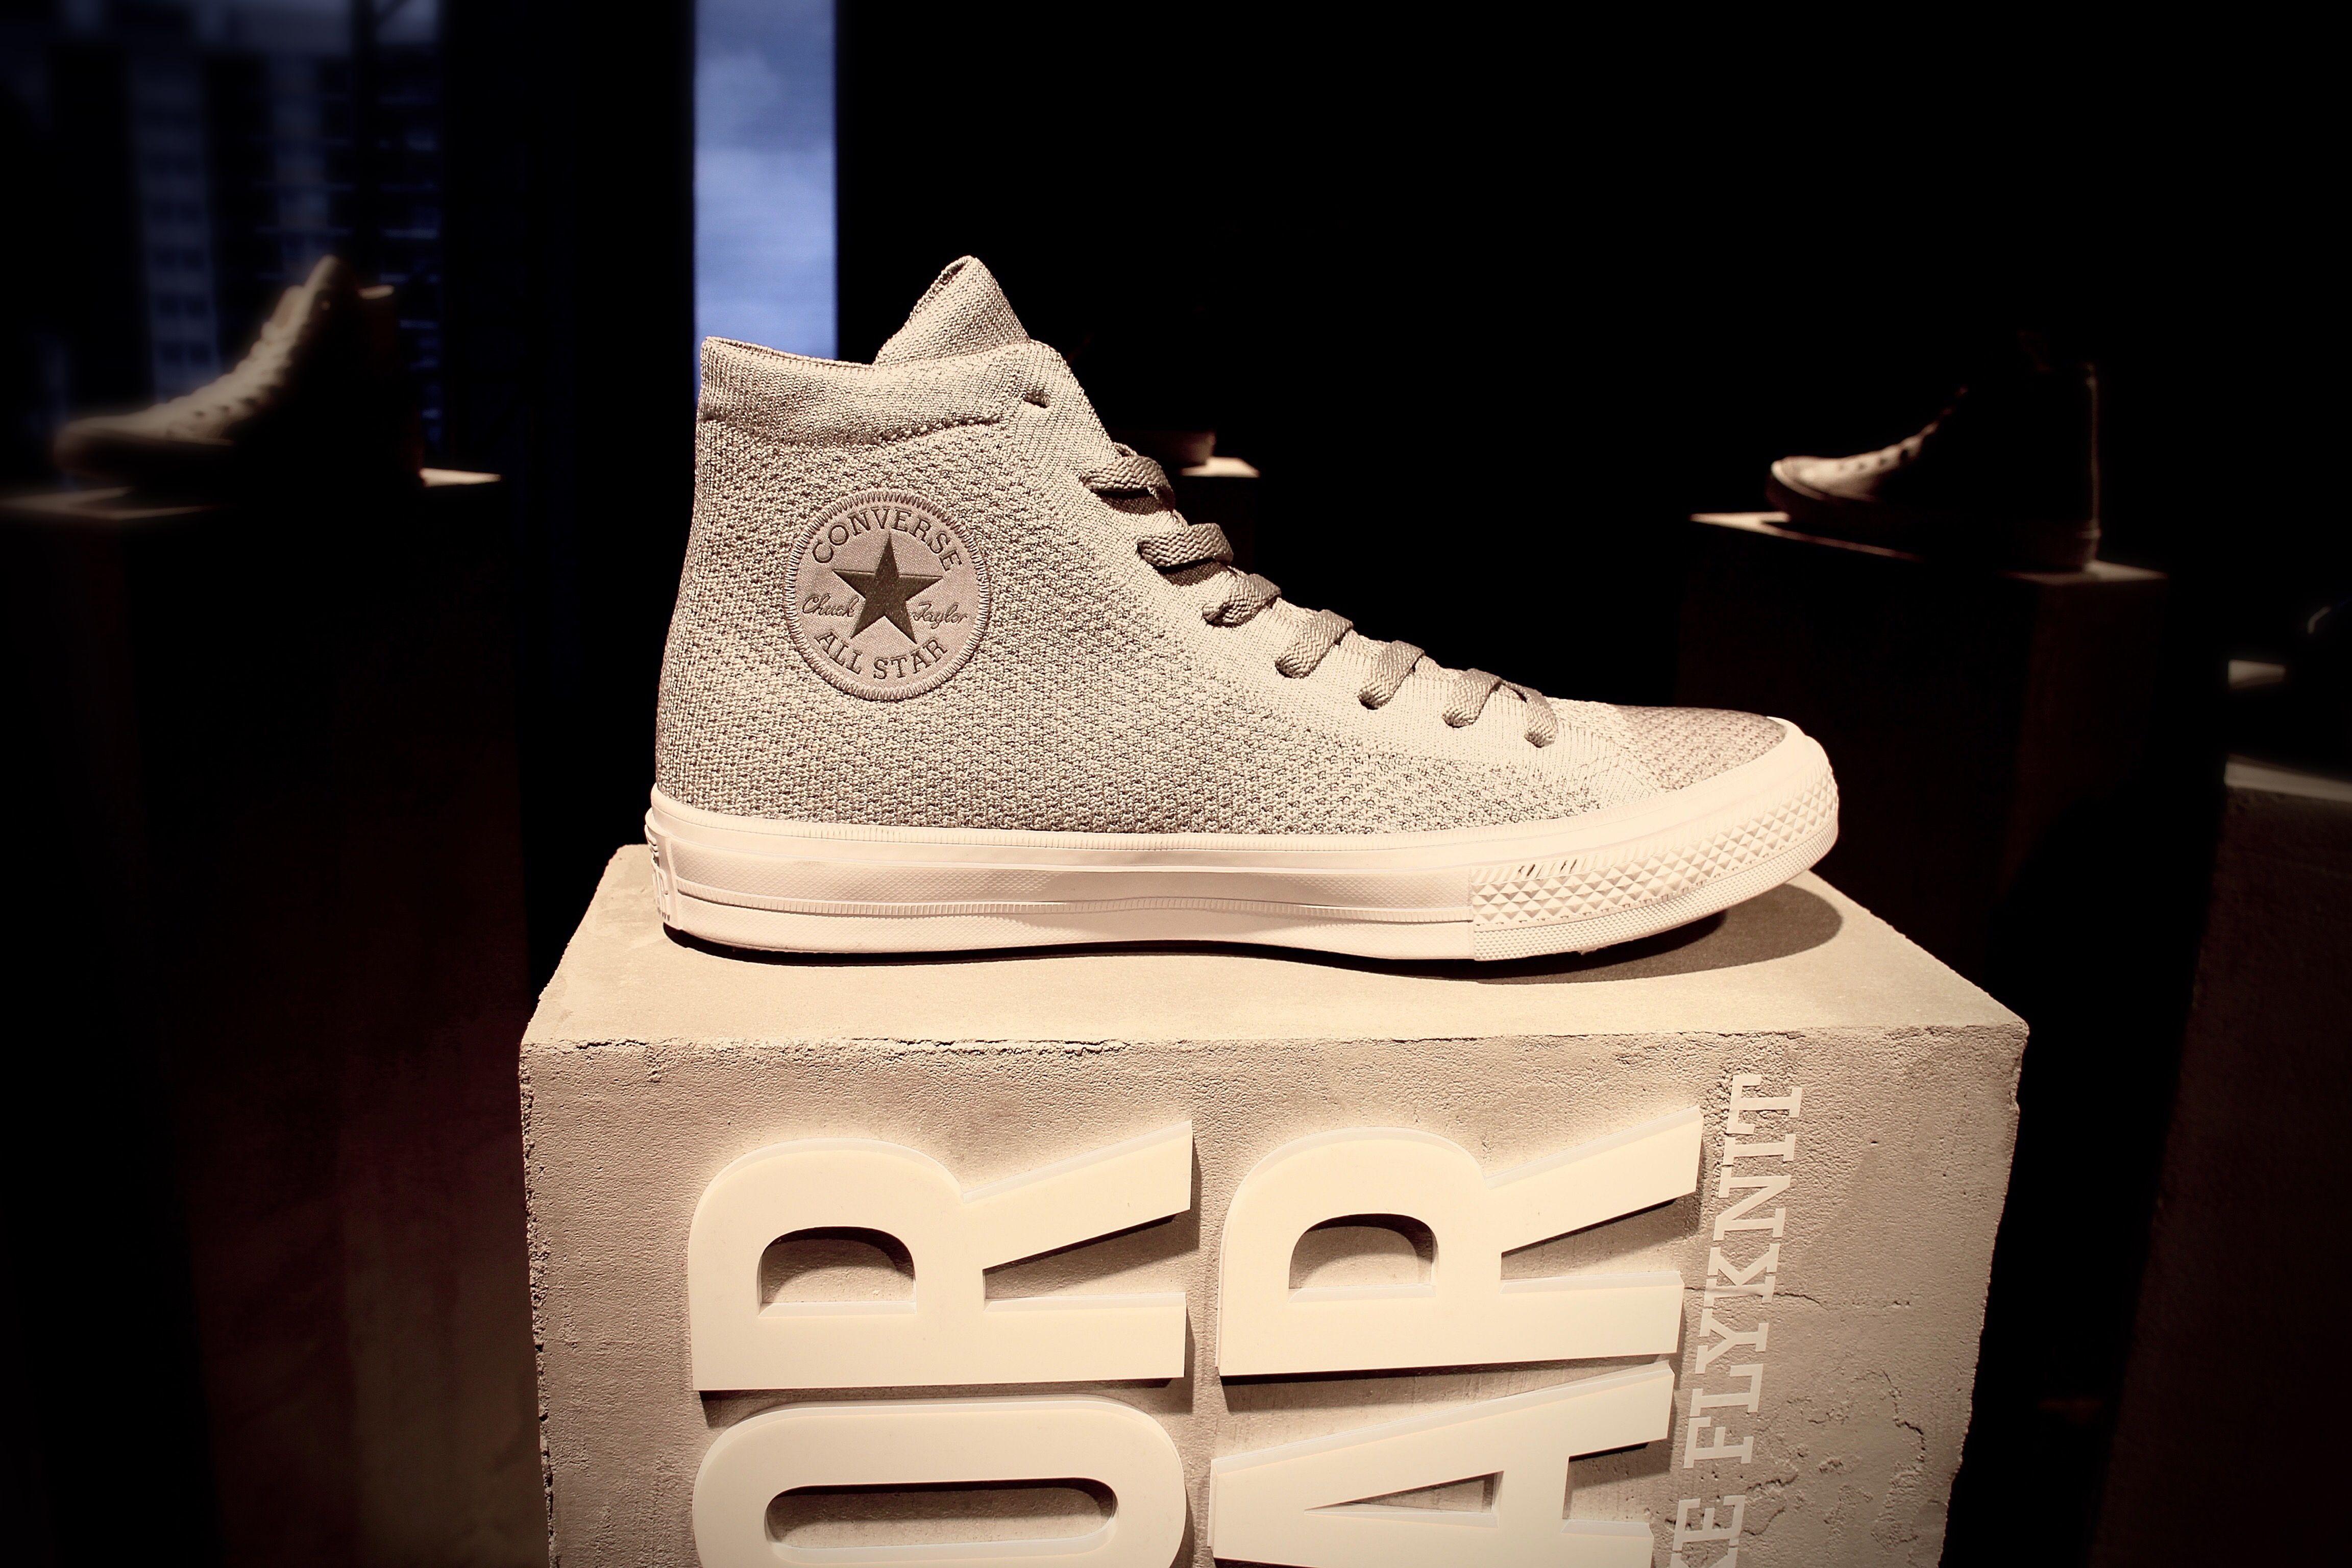 fcf3521afe Converse Chuck Taylor All Star x Nike Flyknit - Launch Recap - EU Kicks   Sneaker Magazine